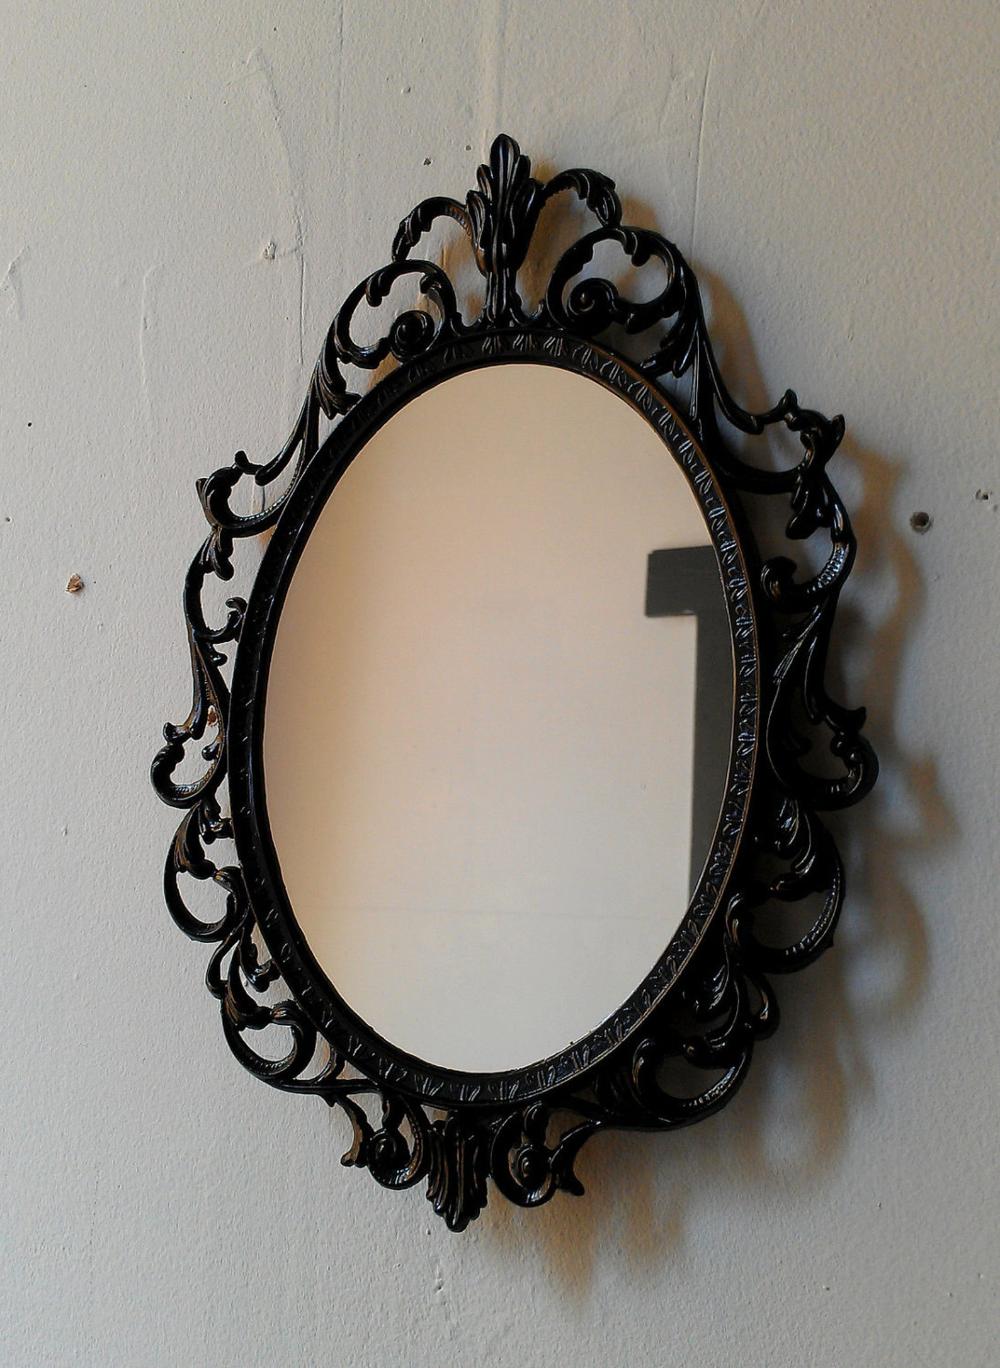 Dark Fairy Tale Mirror Ornate Vintage 10 By 7 Inch Frame In Etsy Vintage Brass Frame Mirror Ornate Mirror